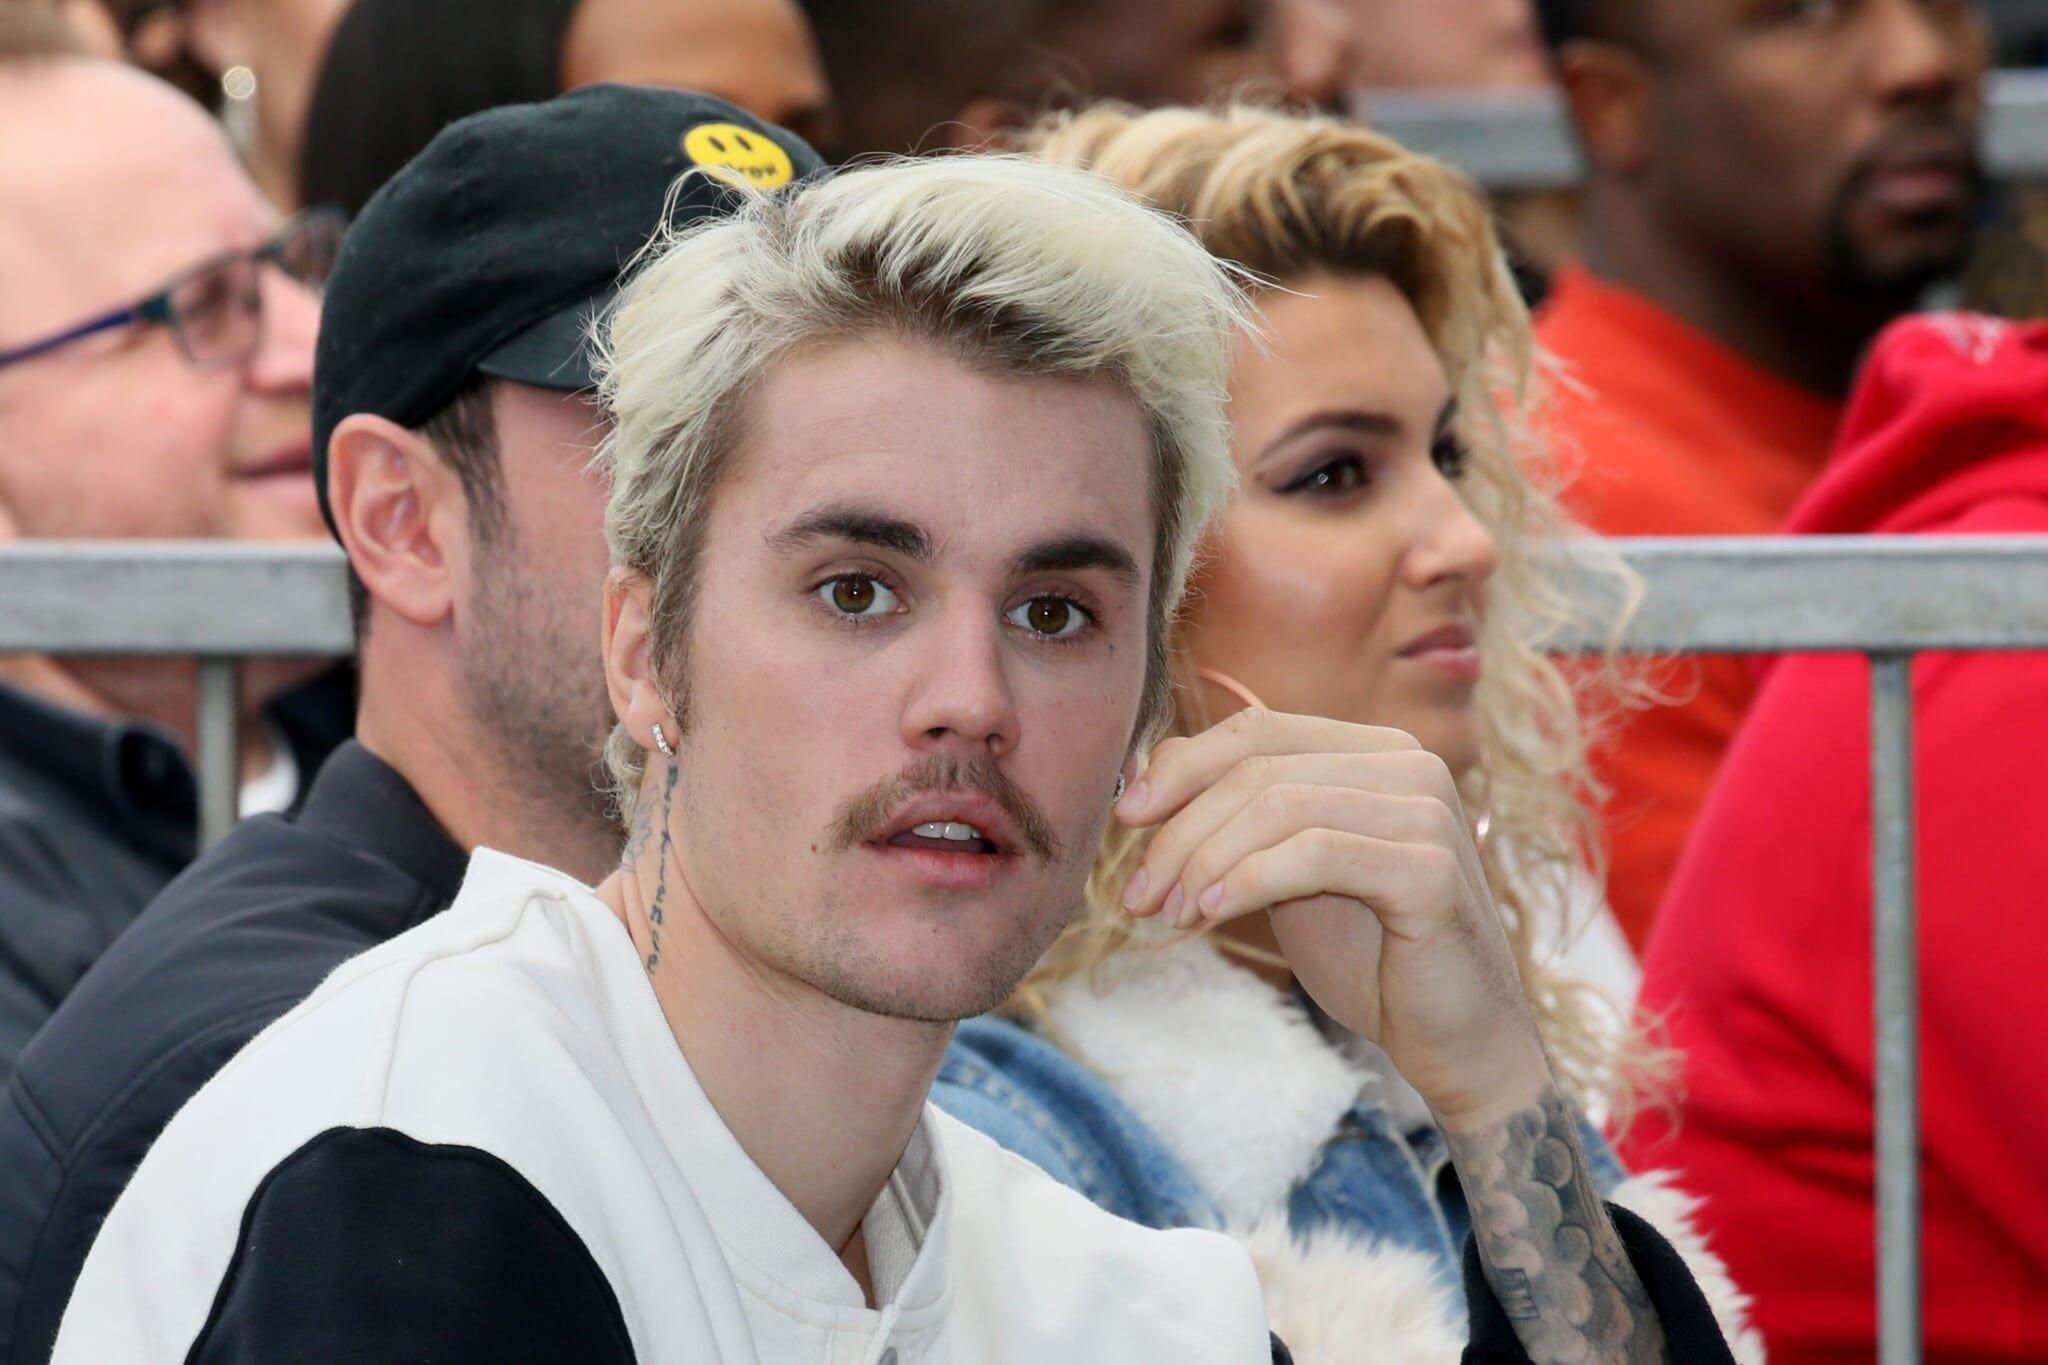 Justin Bieber facing backlash over album name, MLK quotes